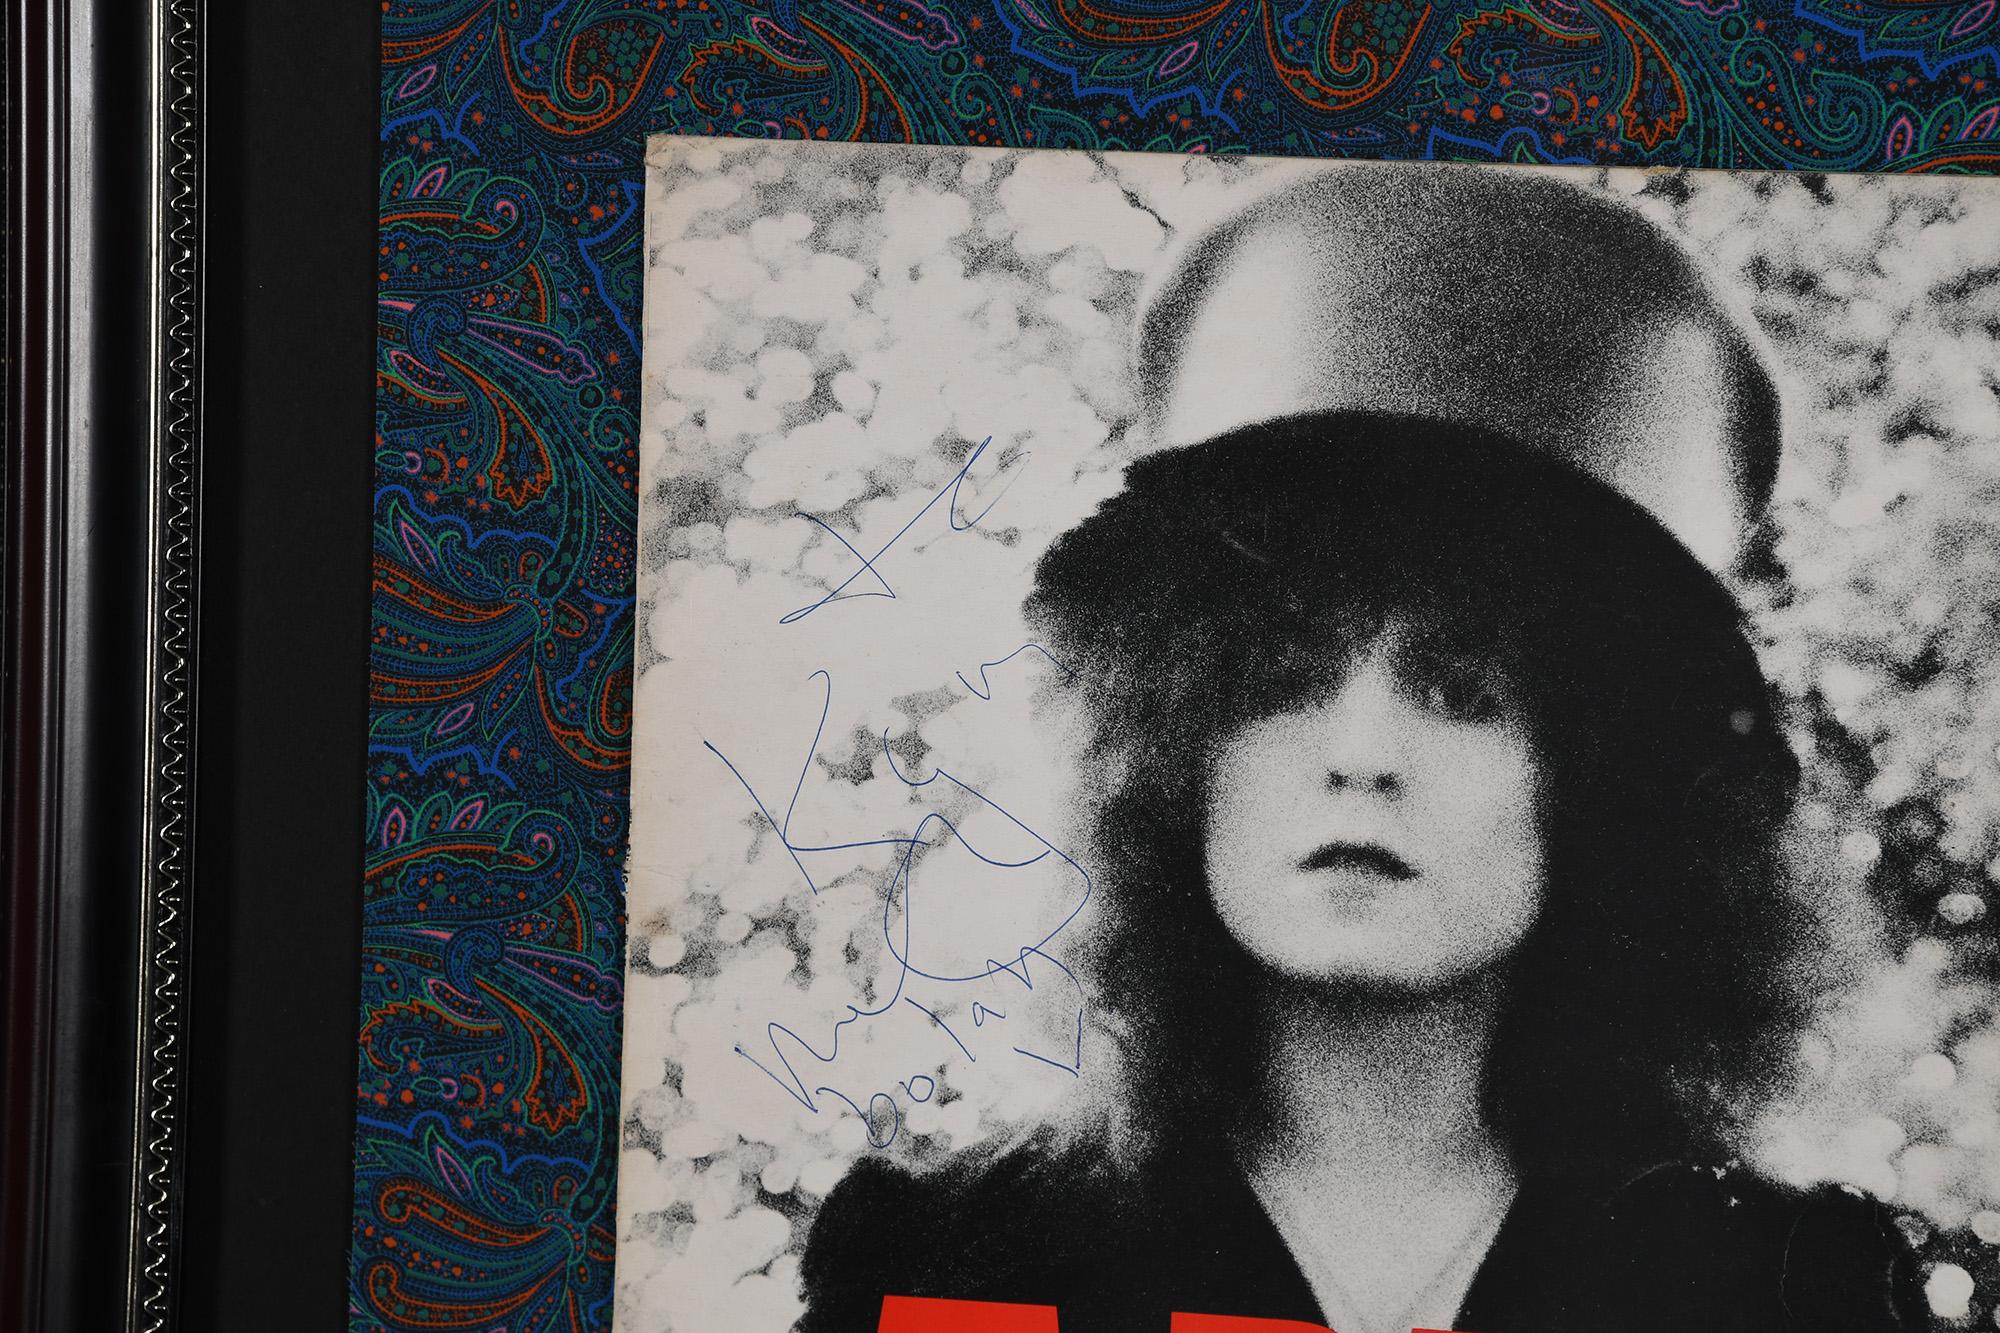 Marc Bolan Framed Signature Presentation - Image 3 of 3